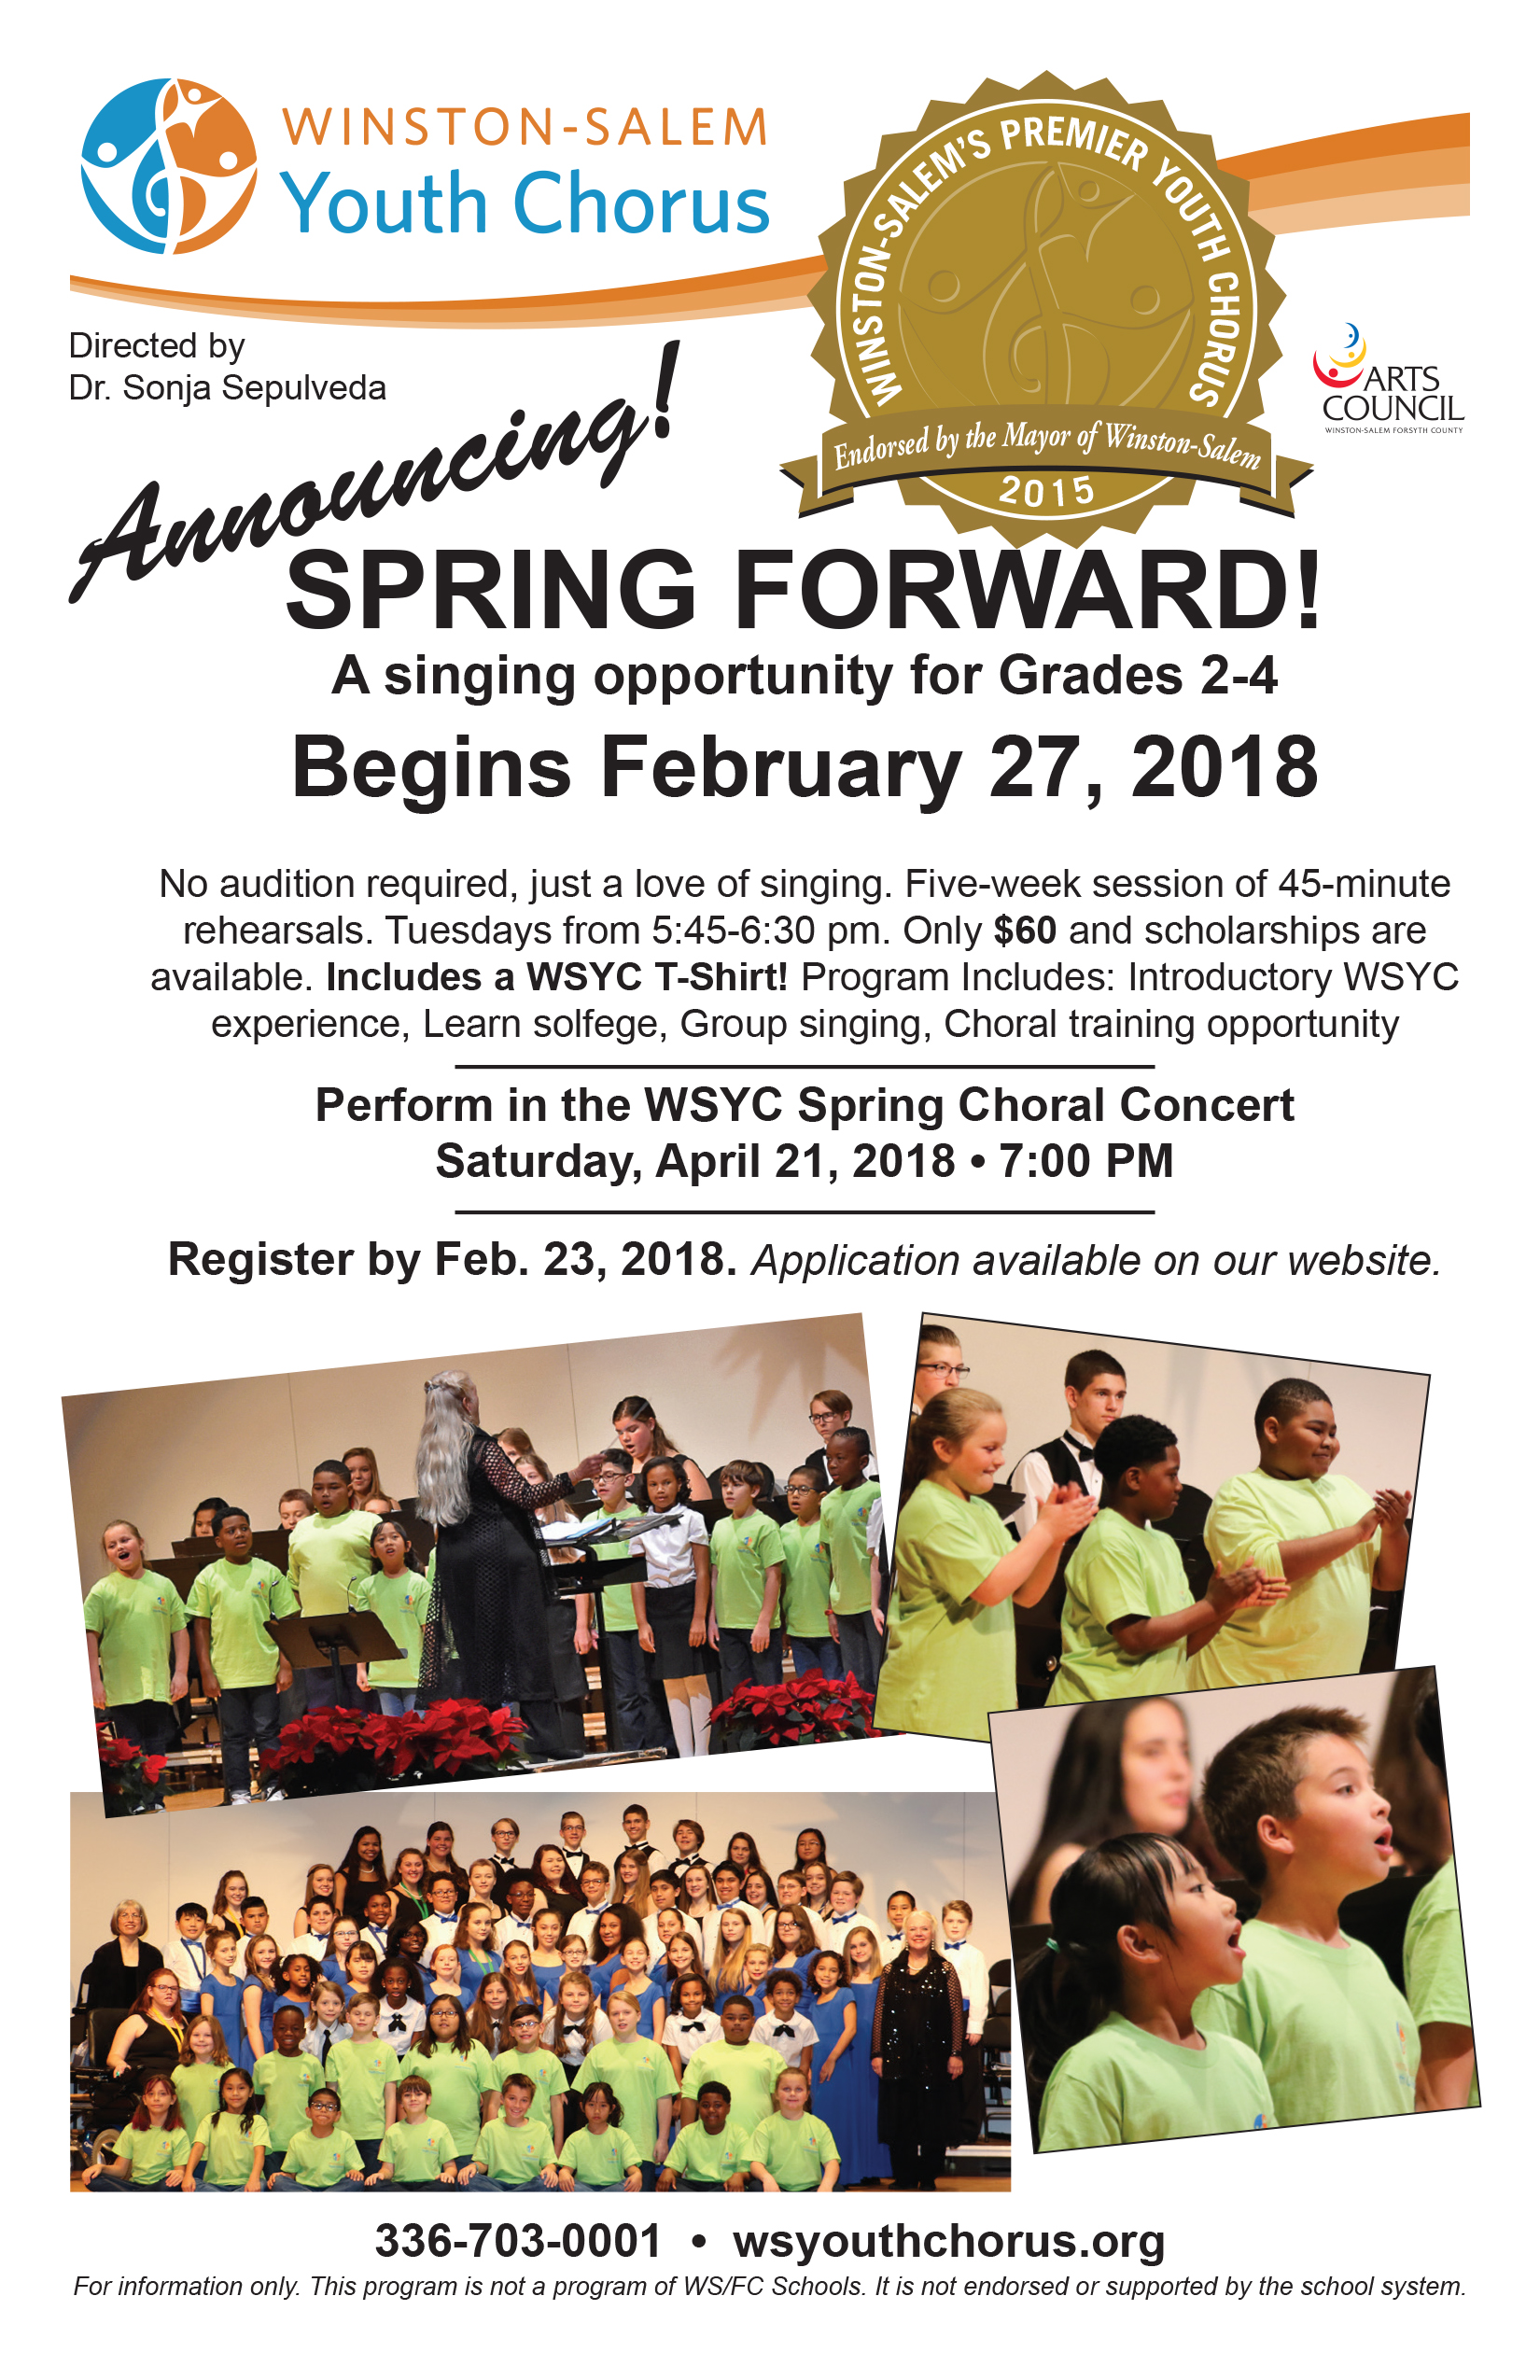 Winston-Salem Youth Chorus Spring Forward